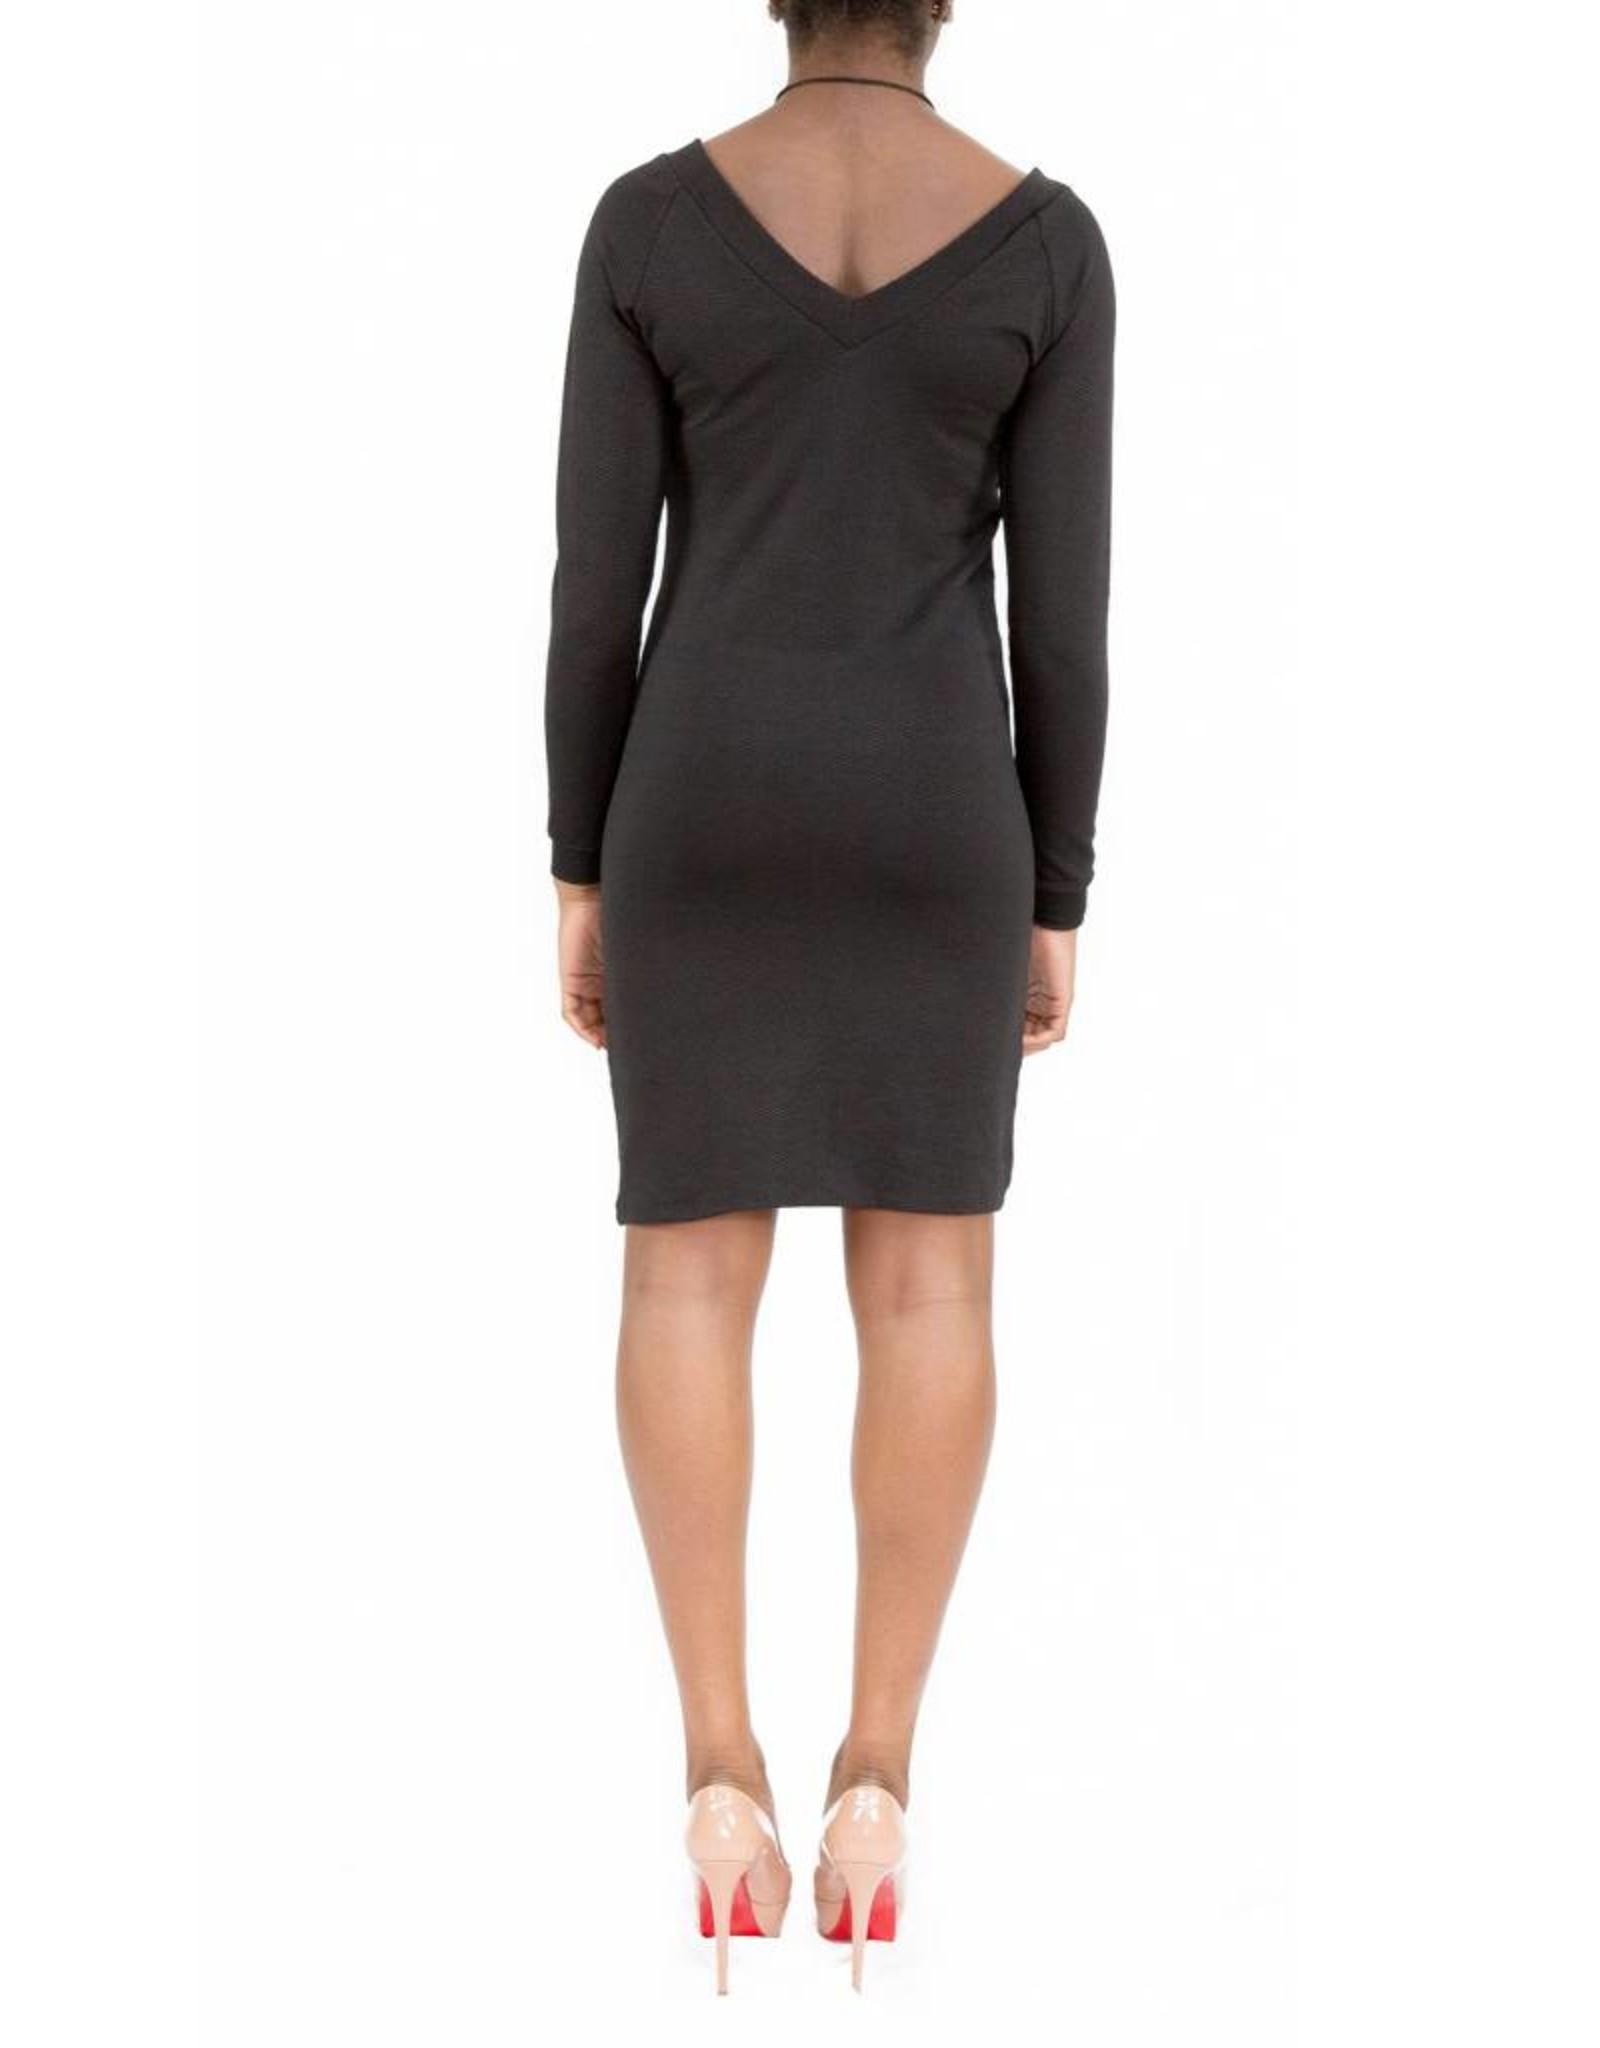 Hailey Dress Black V-Neck